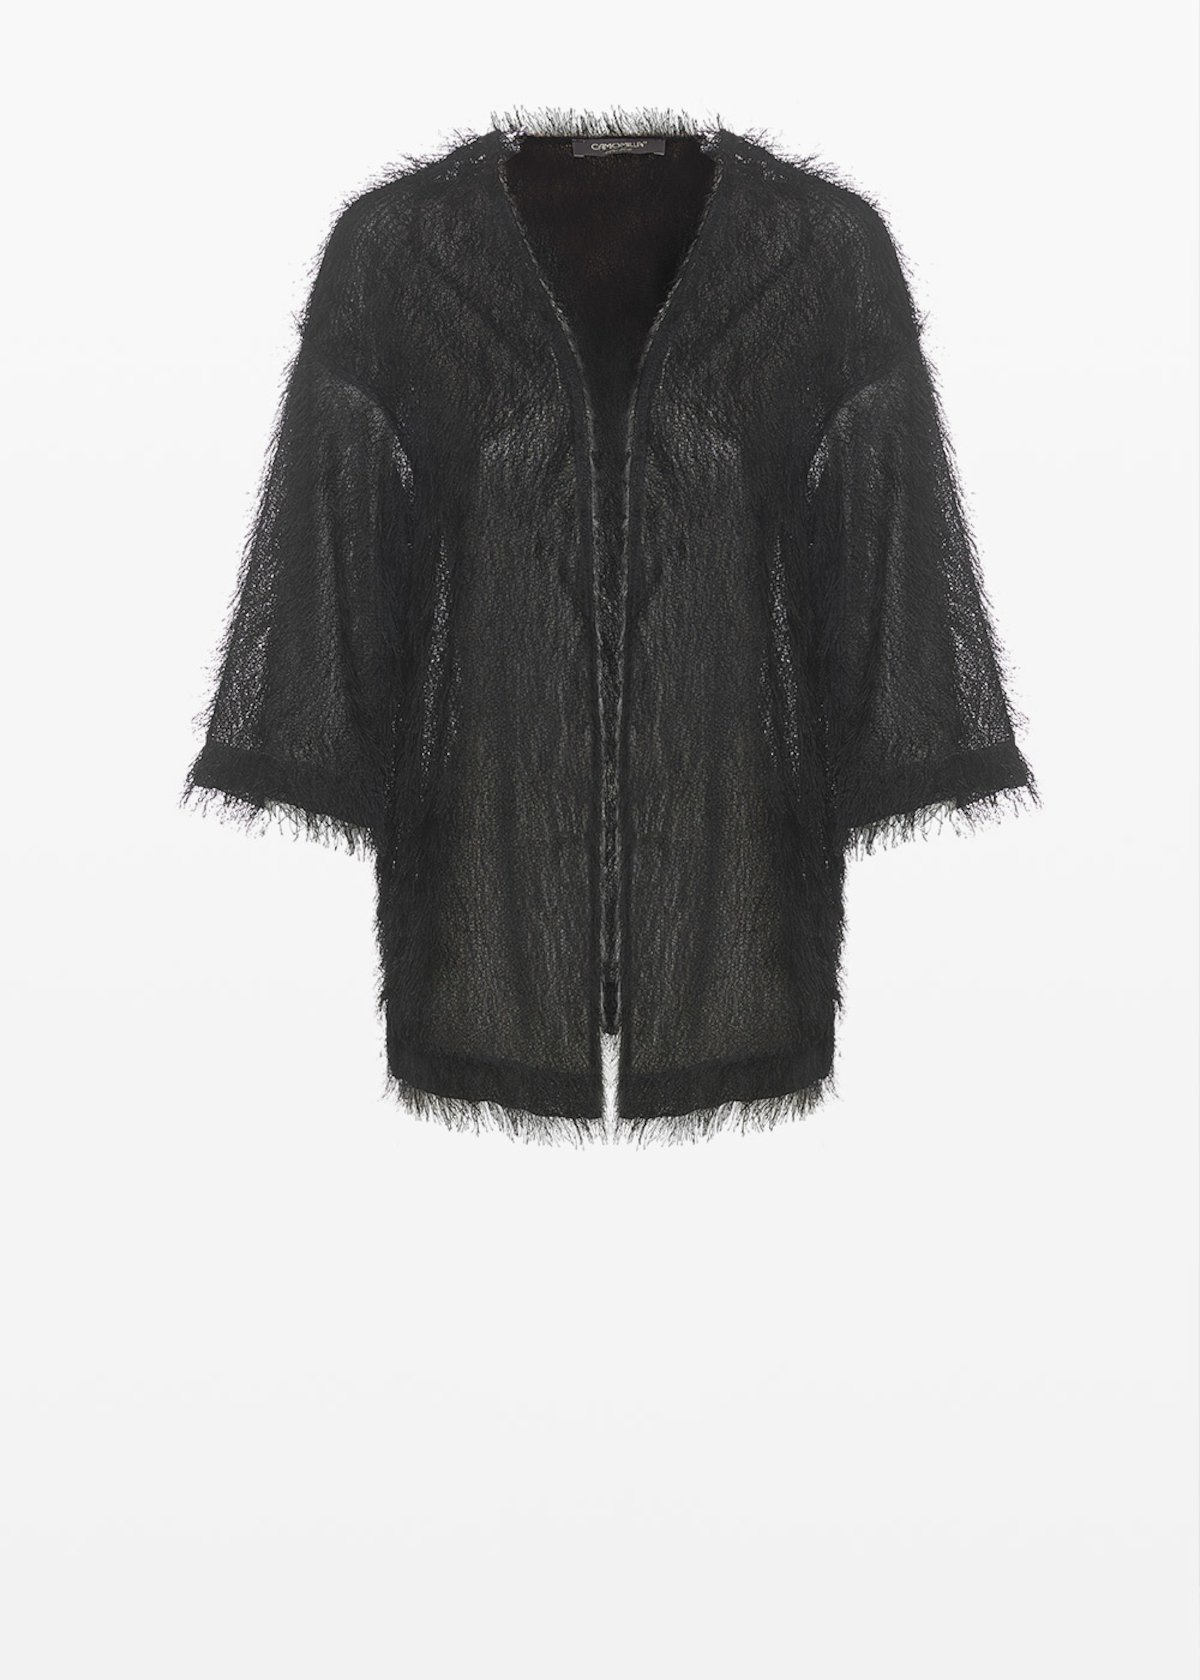 Craing faux fur unlined shrug - Black - Woman